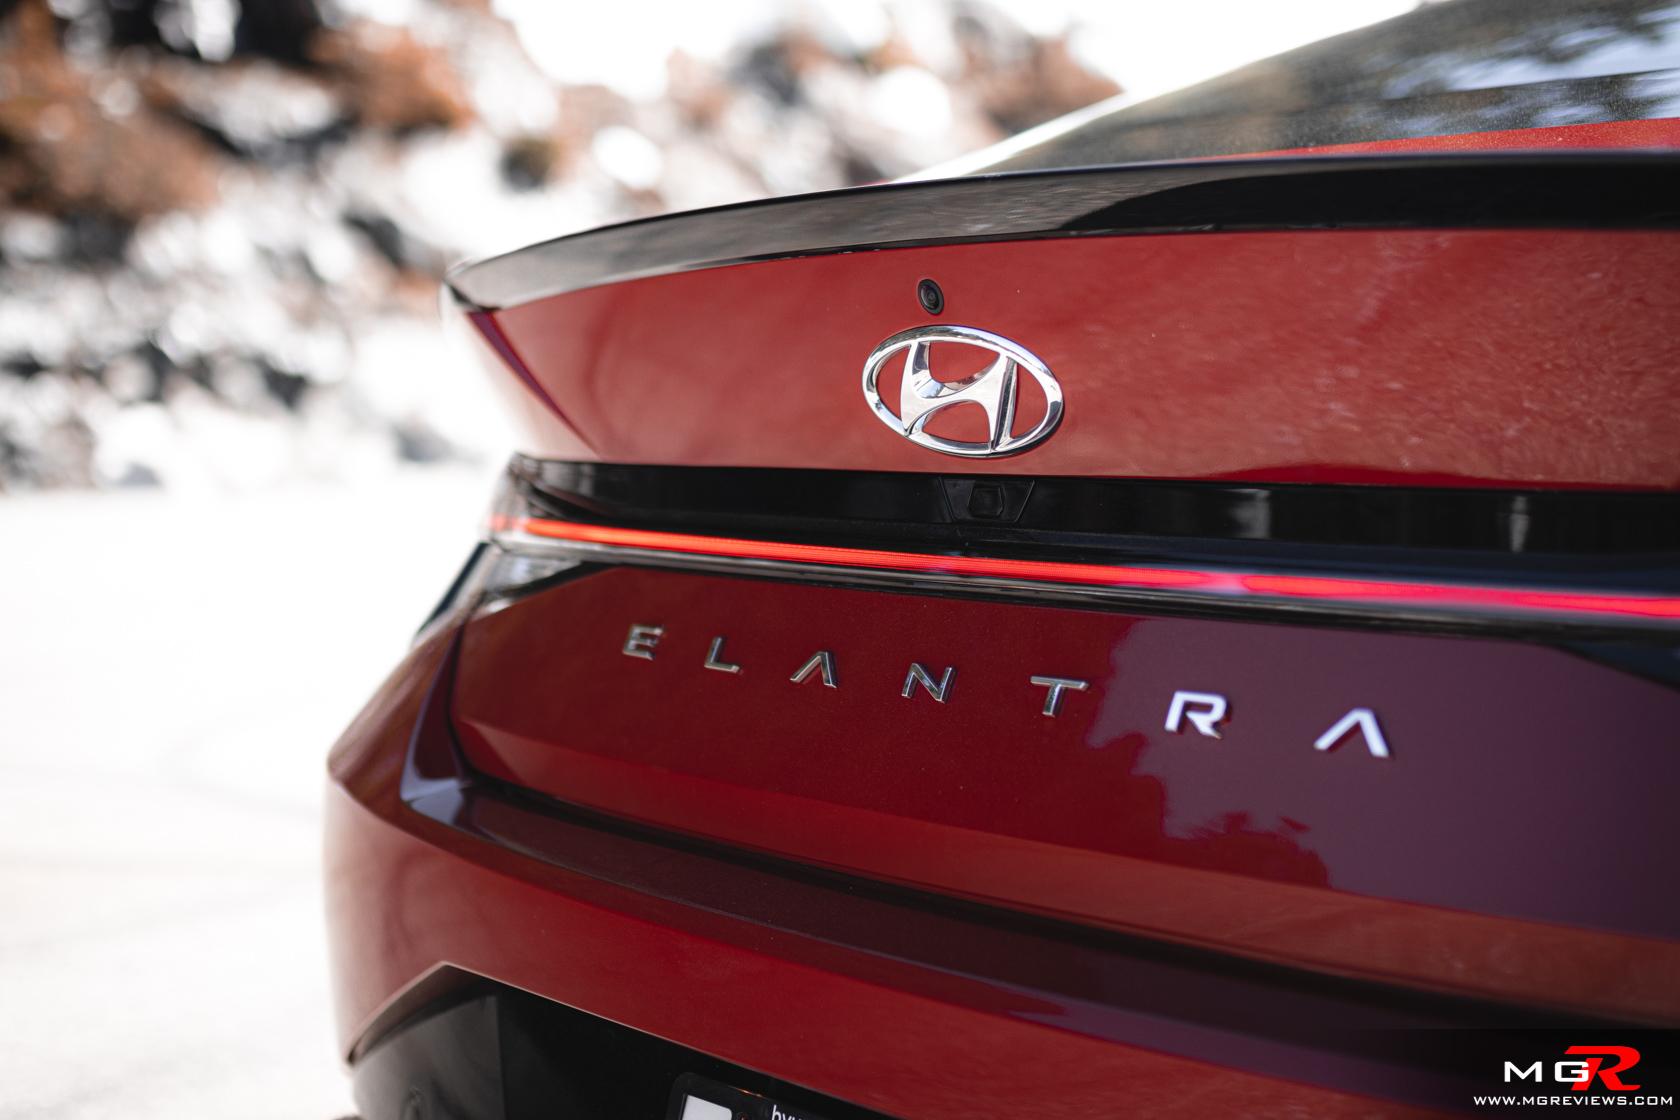 2021 Hyundai Elantra N-Line